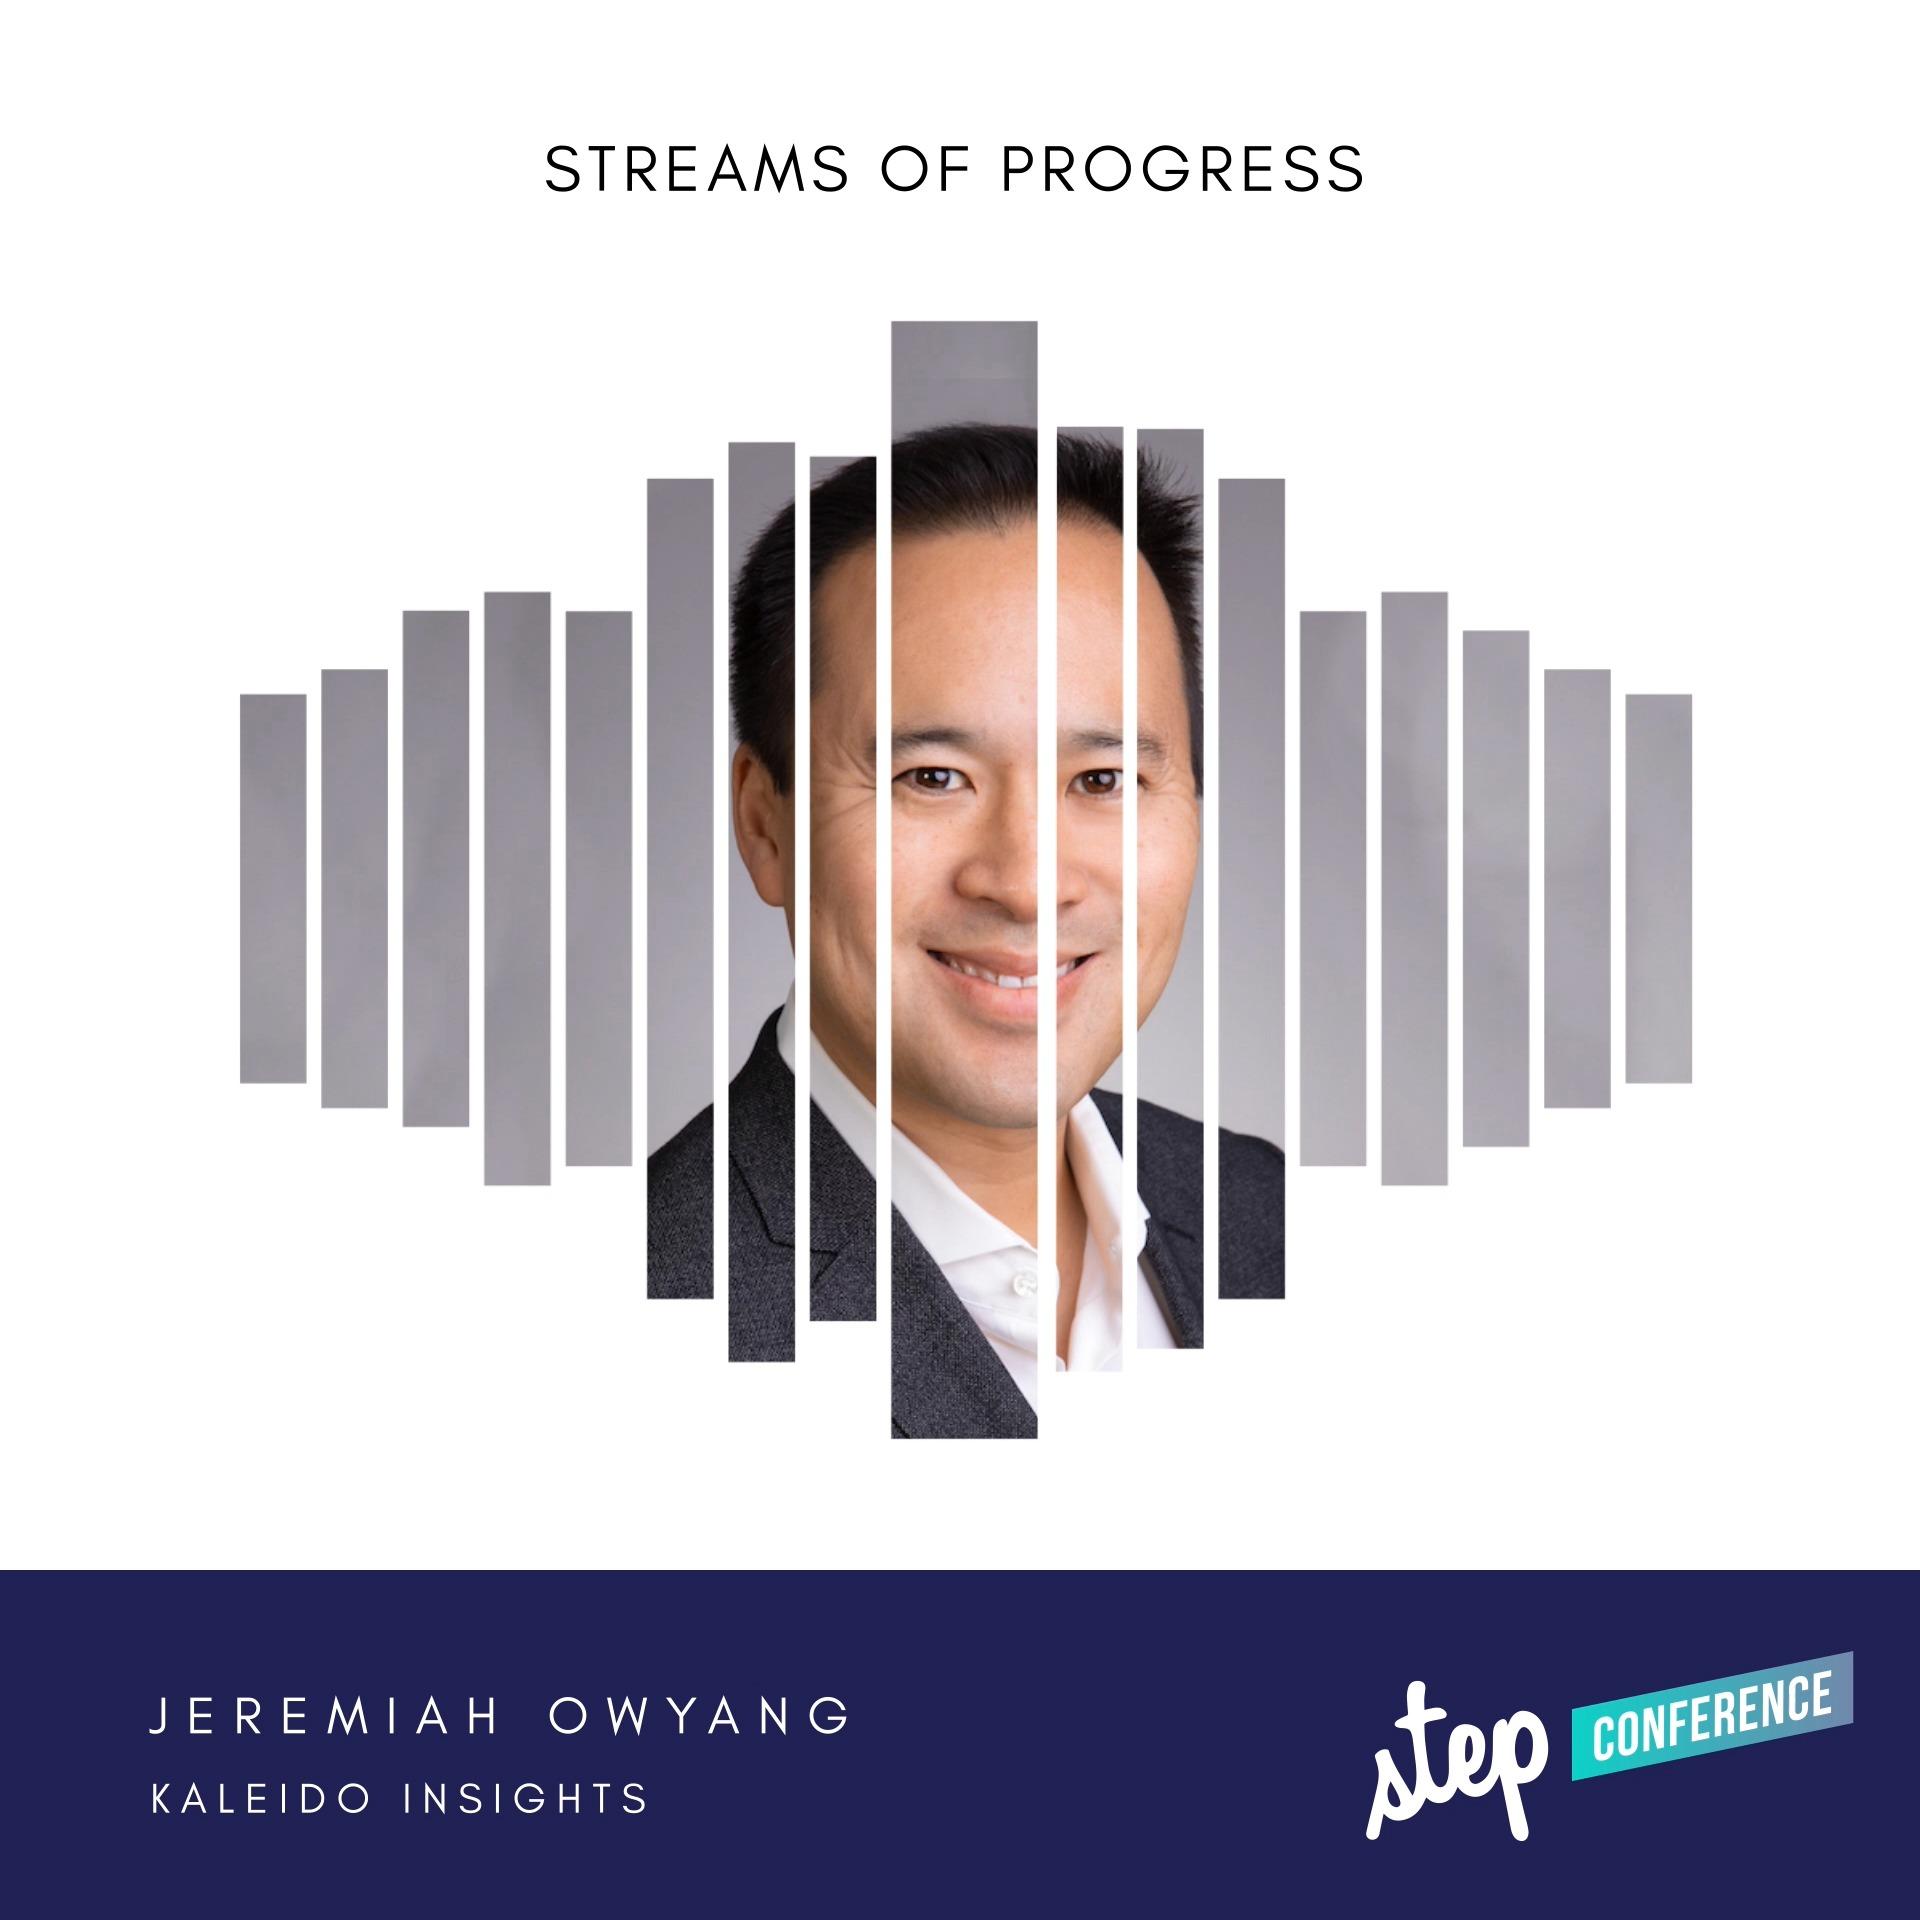 STEP2020 - Jeremiah Owyang, Kaleido Insights